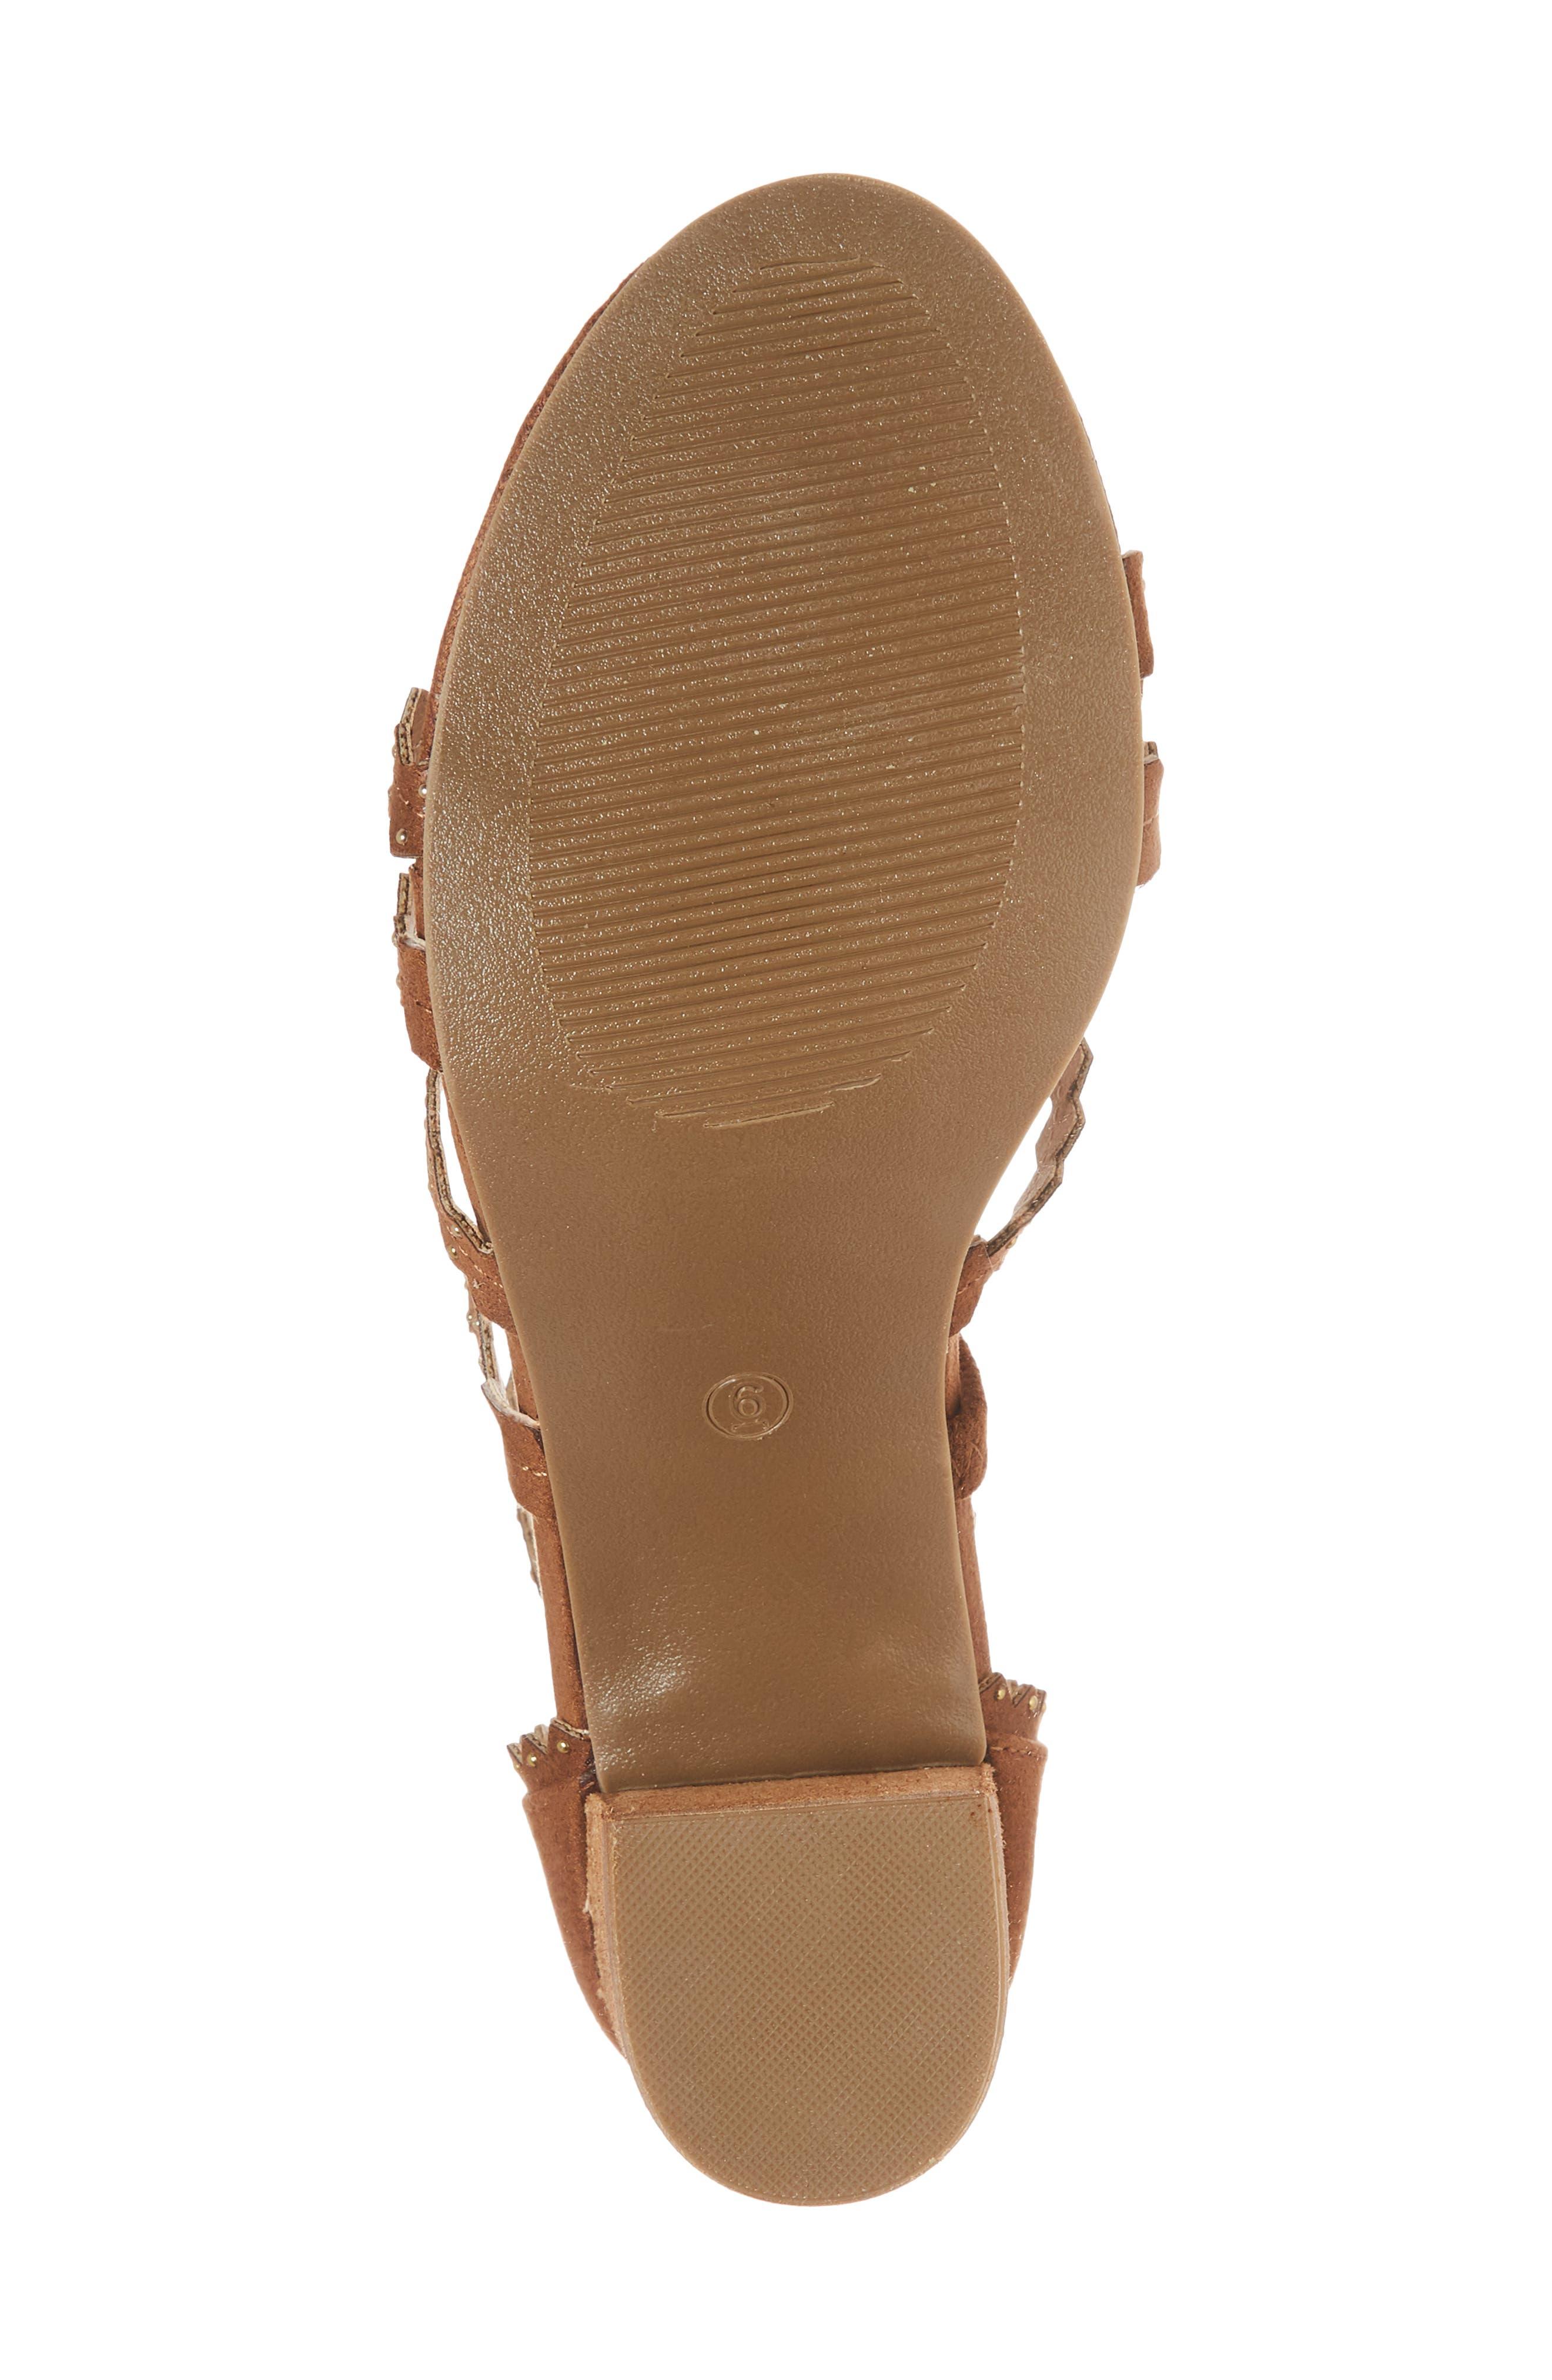 Aiden Block Heel Sandal,                             Alternate thumbnail 6, color,                             SADDLE SUEDE